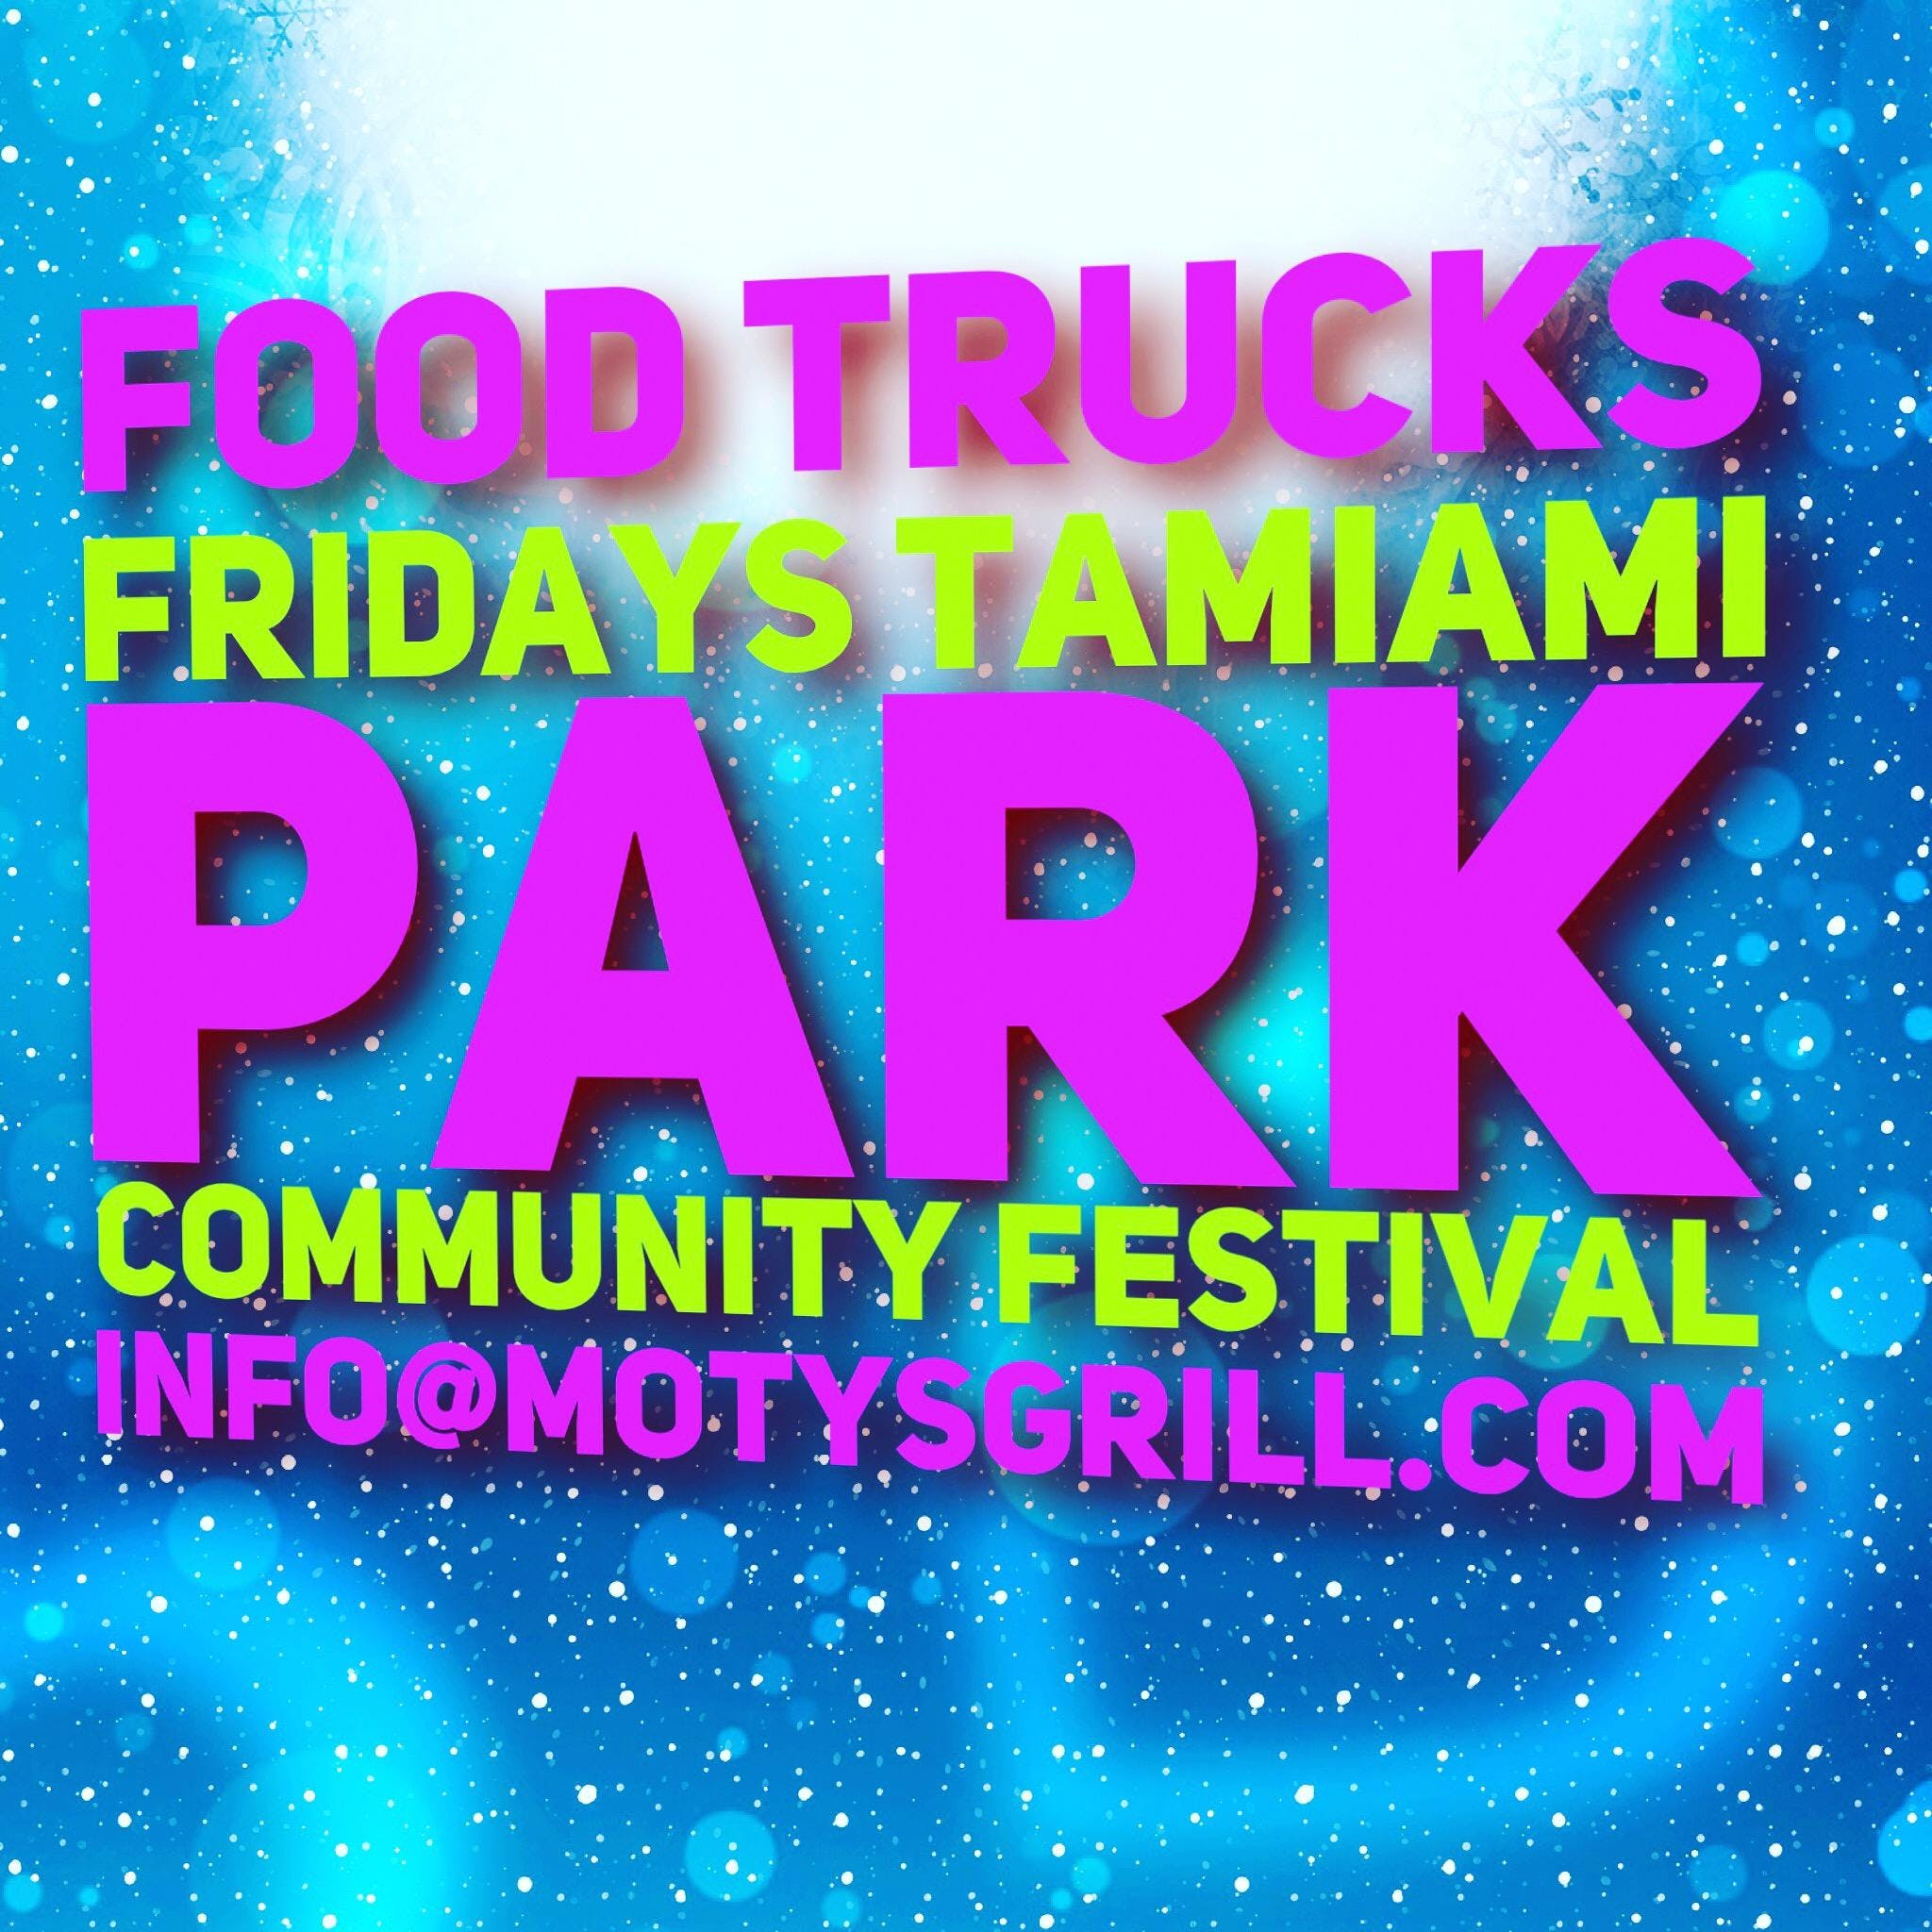 Food trucks Fridays tamiami park